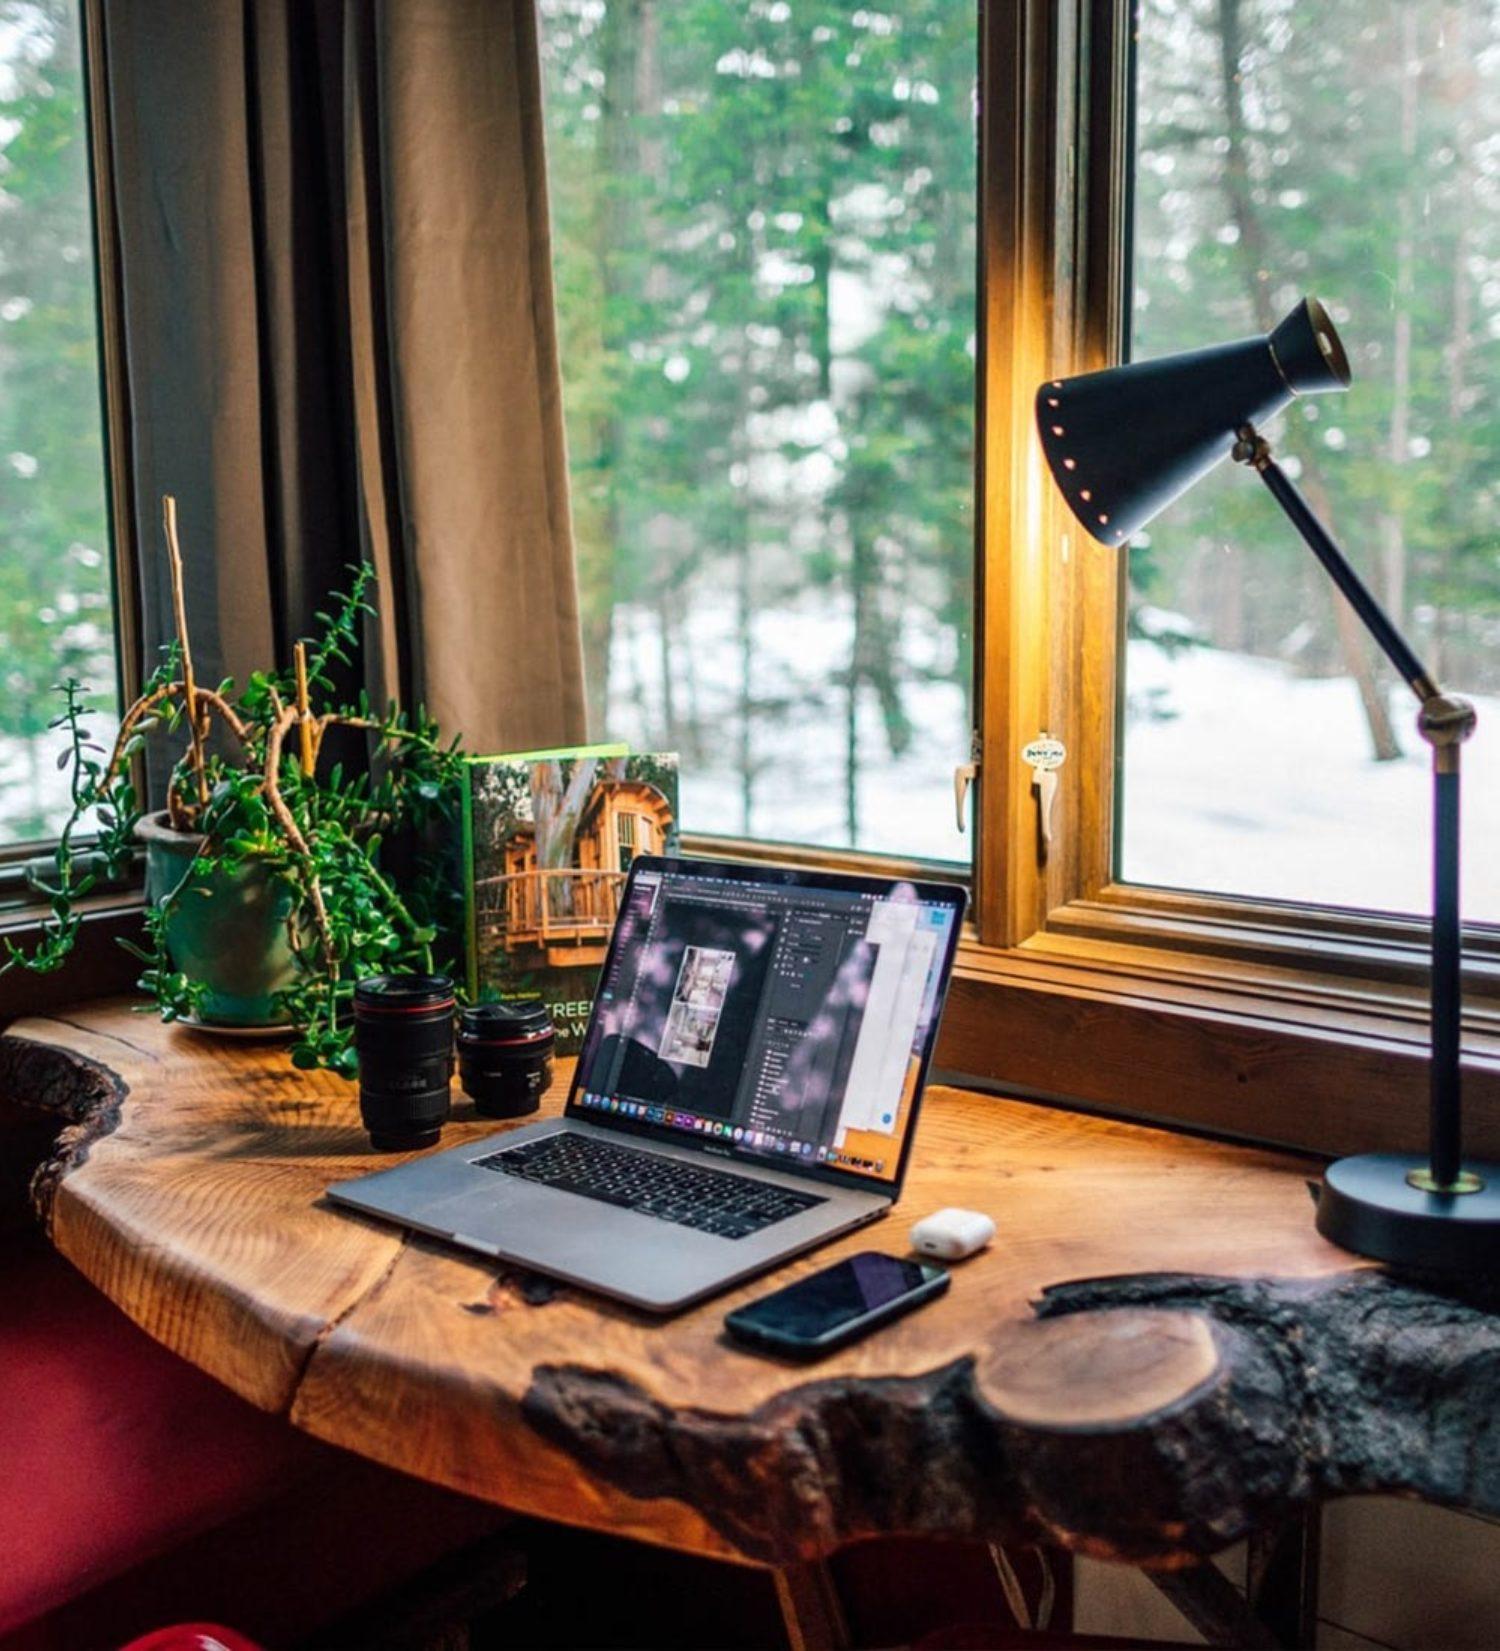 Biophilic design in a home office